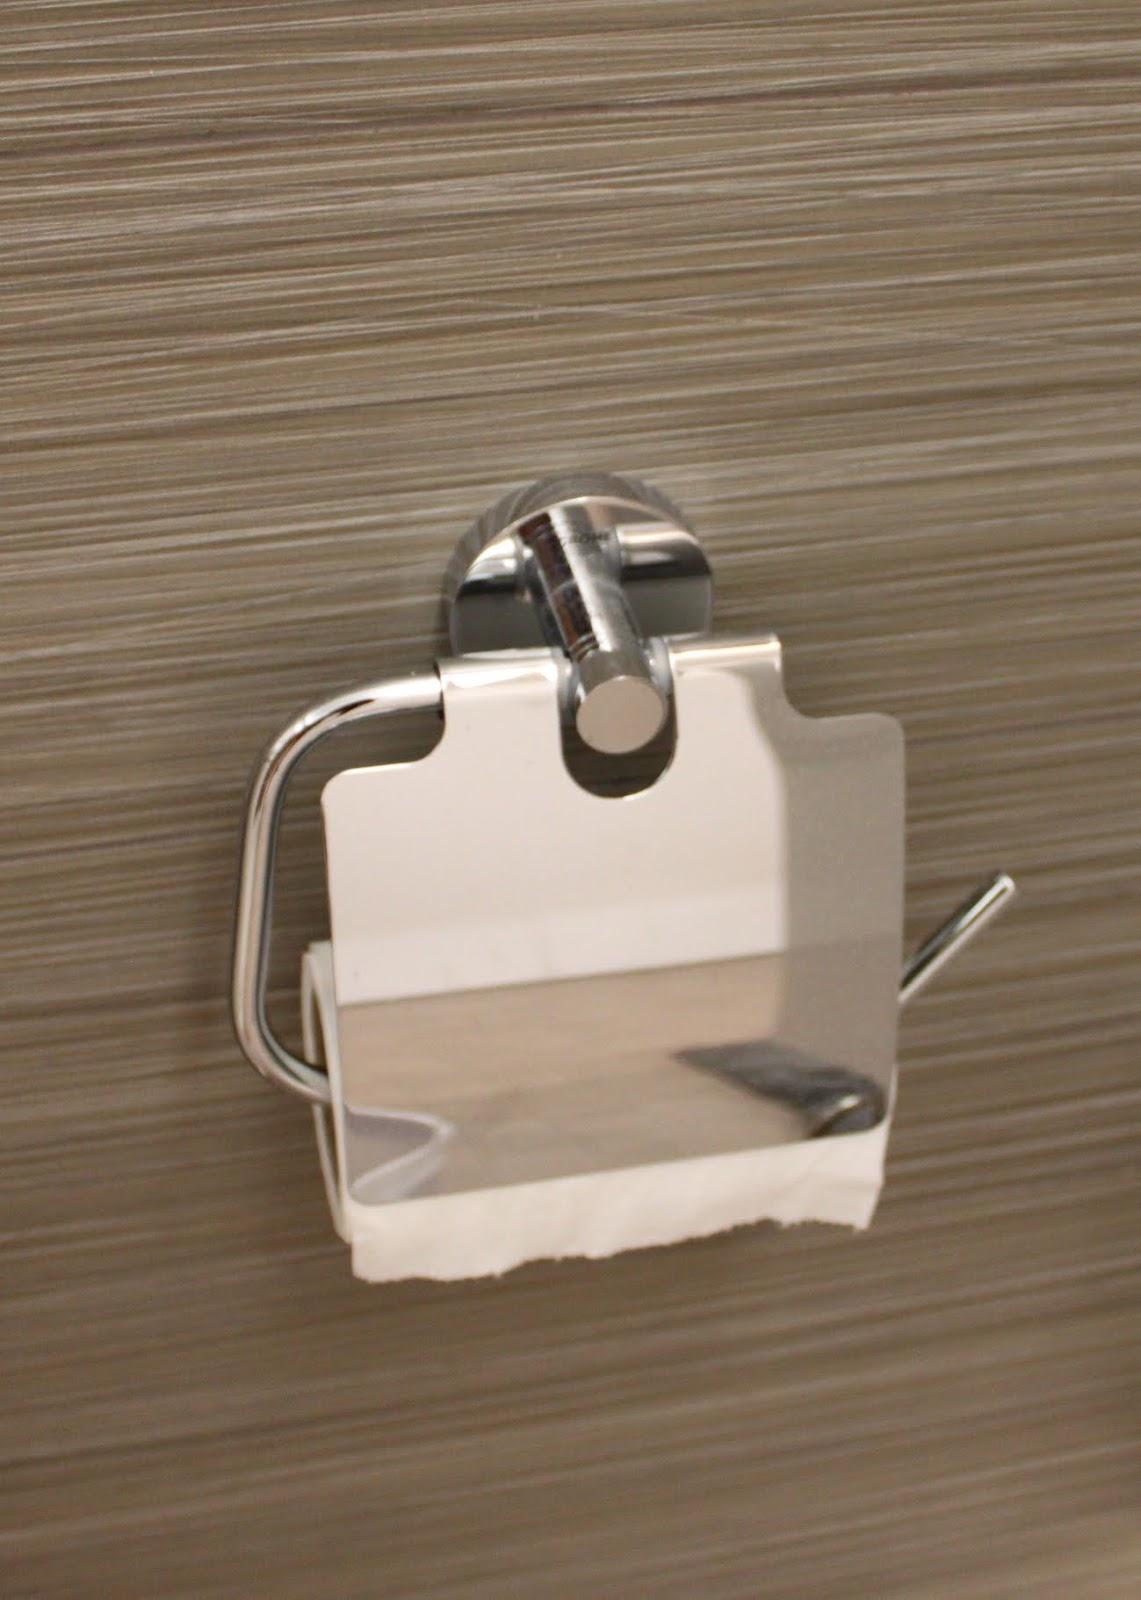 Mid century modern knobs towel bars toilet paper holder - Bathroom towel and toilet paper holders ...